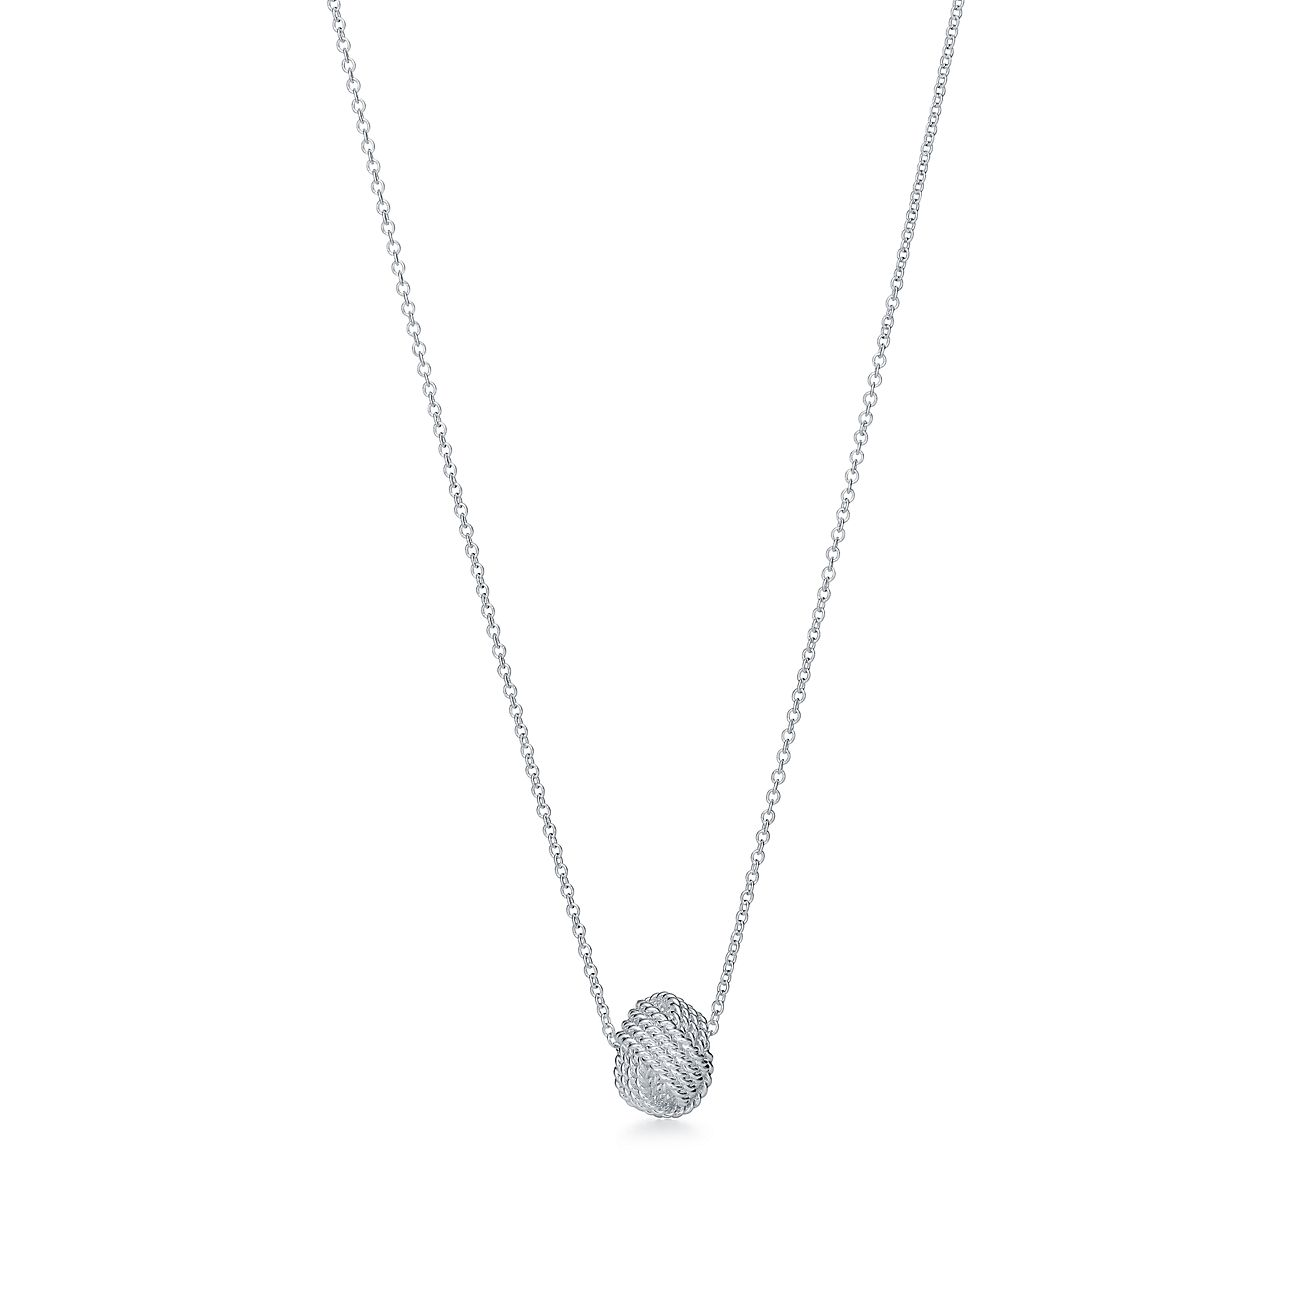 Tiffany Twist Knot Pendant In Sterling Silver Tiffany Co